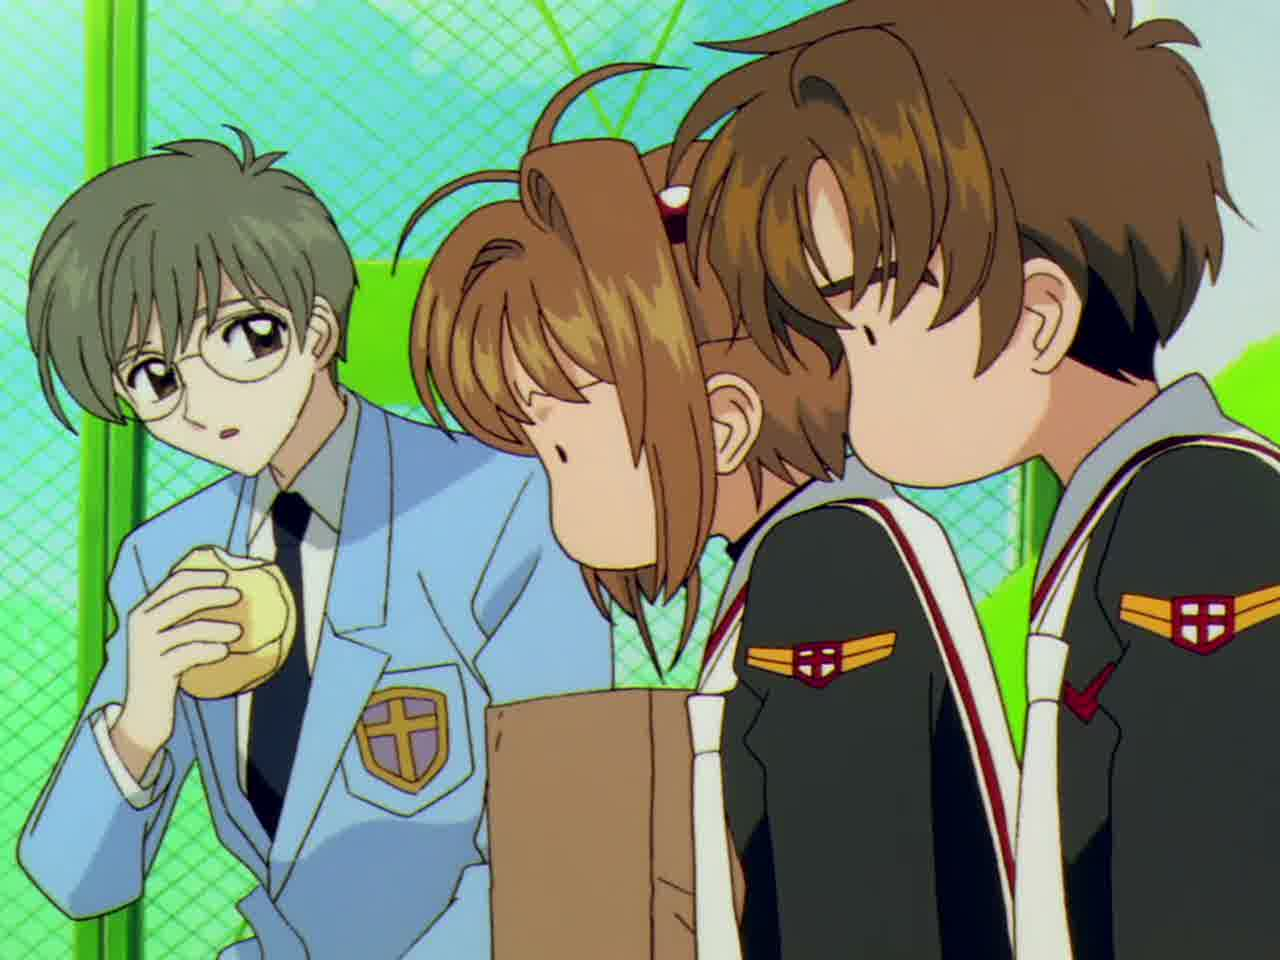 cardcaptor sakura � episode 41 � joshs anime blog